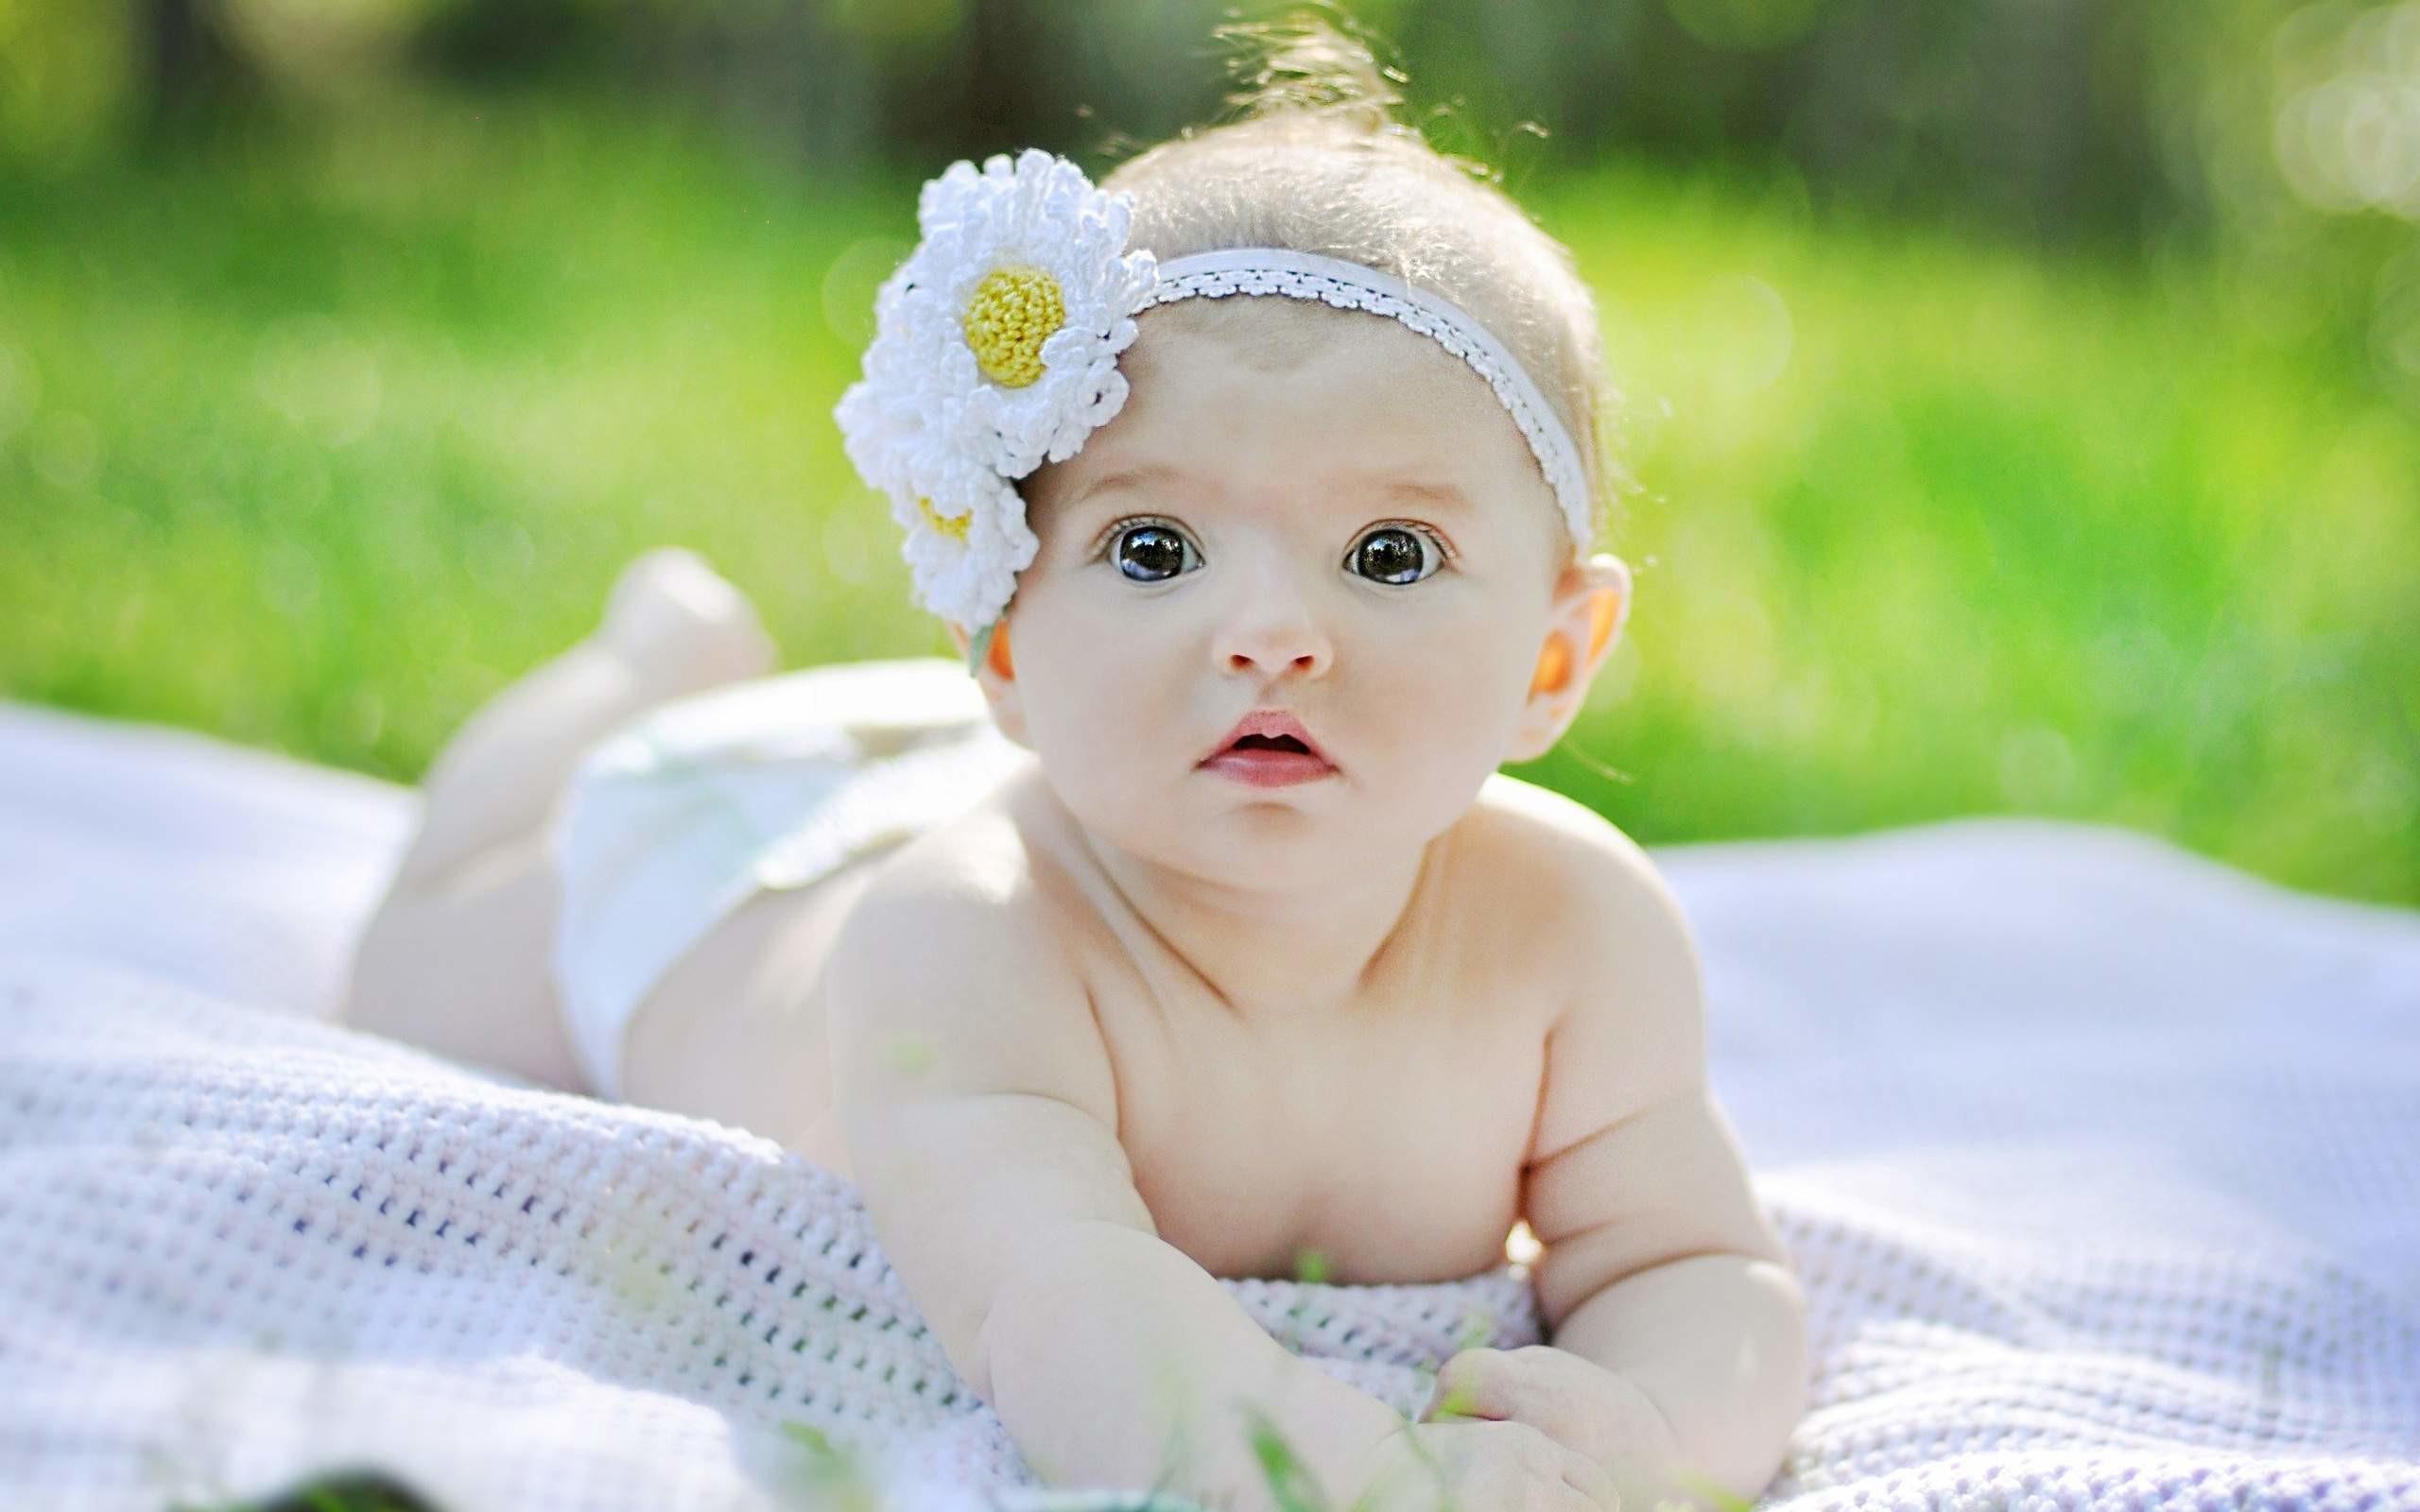 Smiling Cute Babies Wallpaper 62 Images